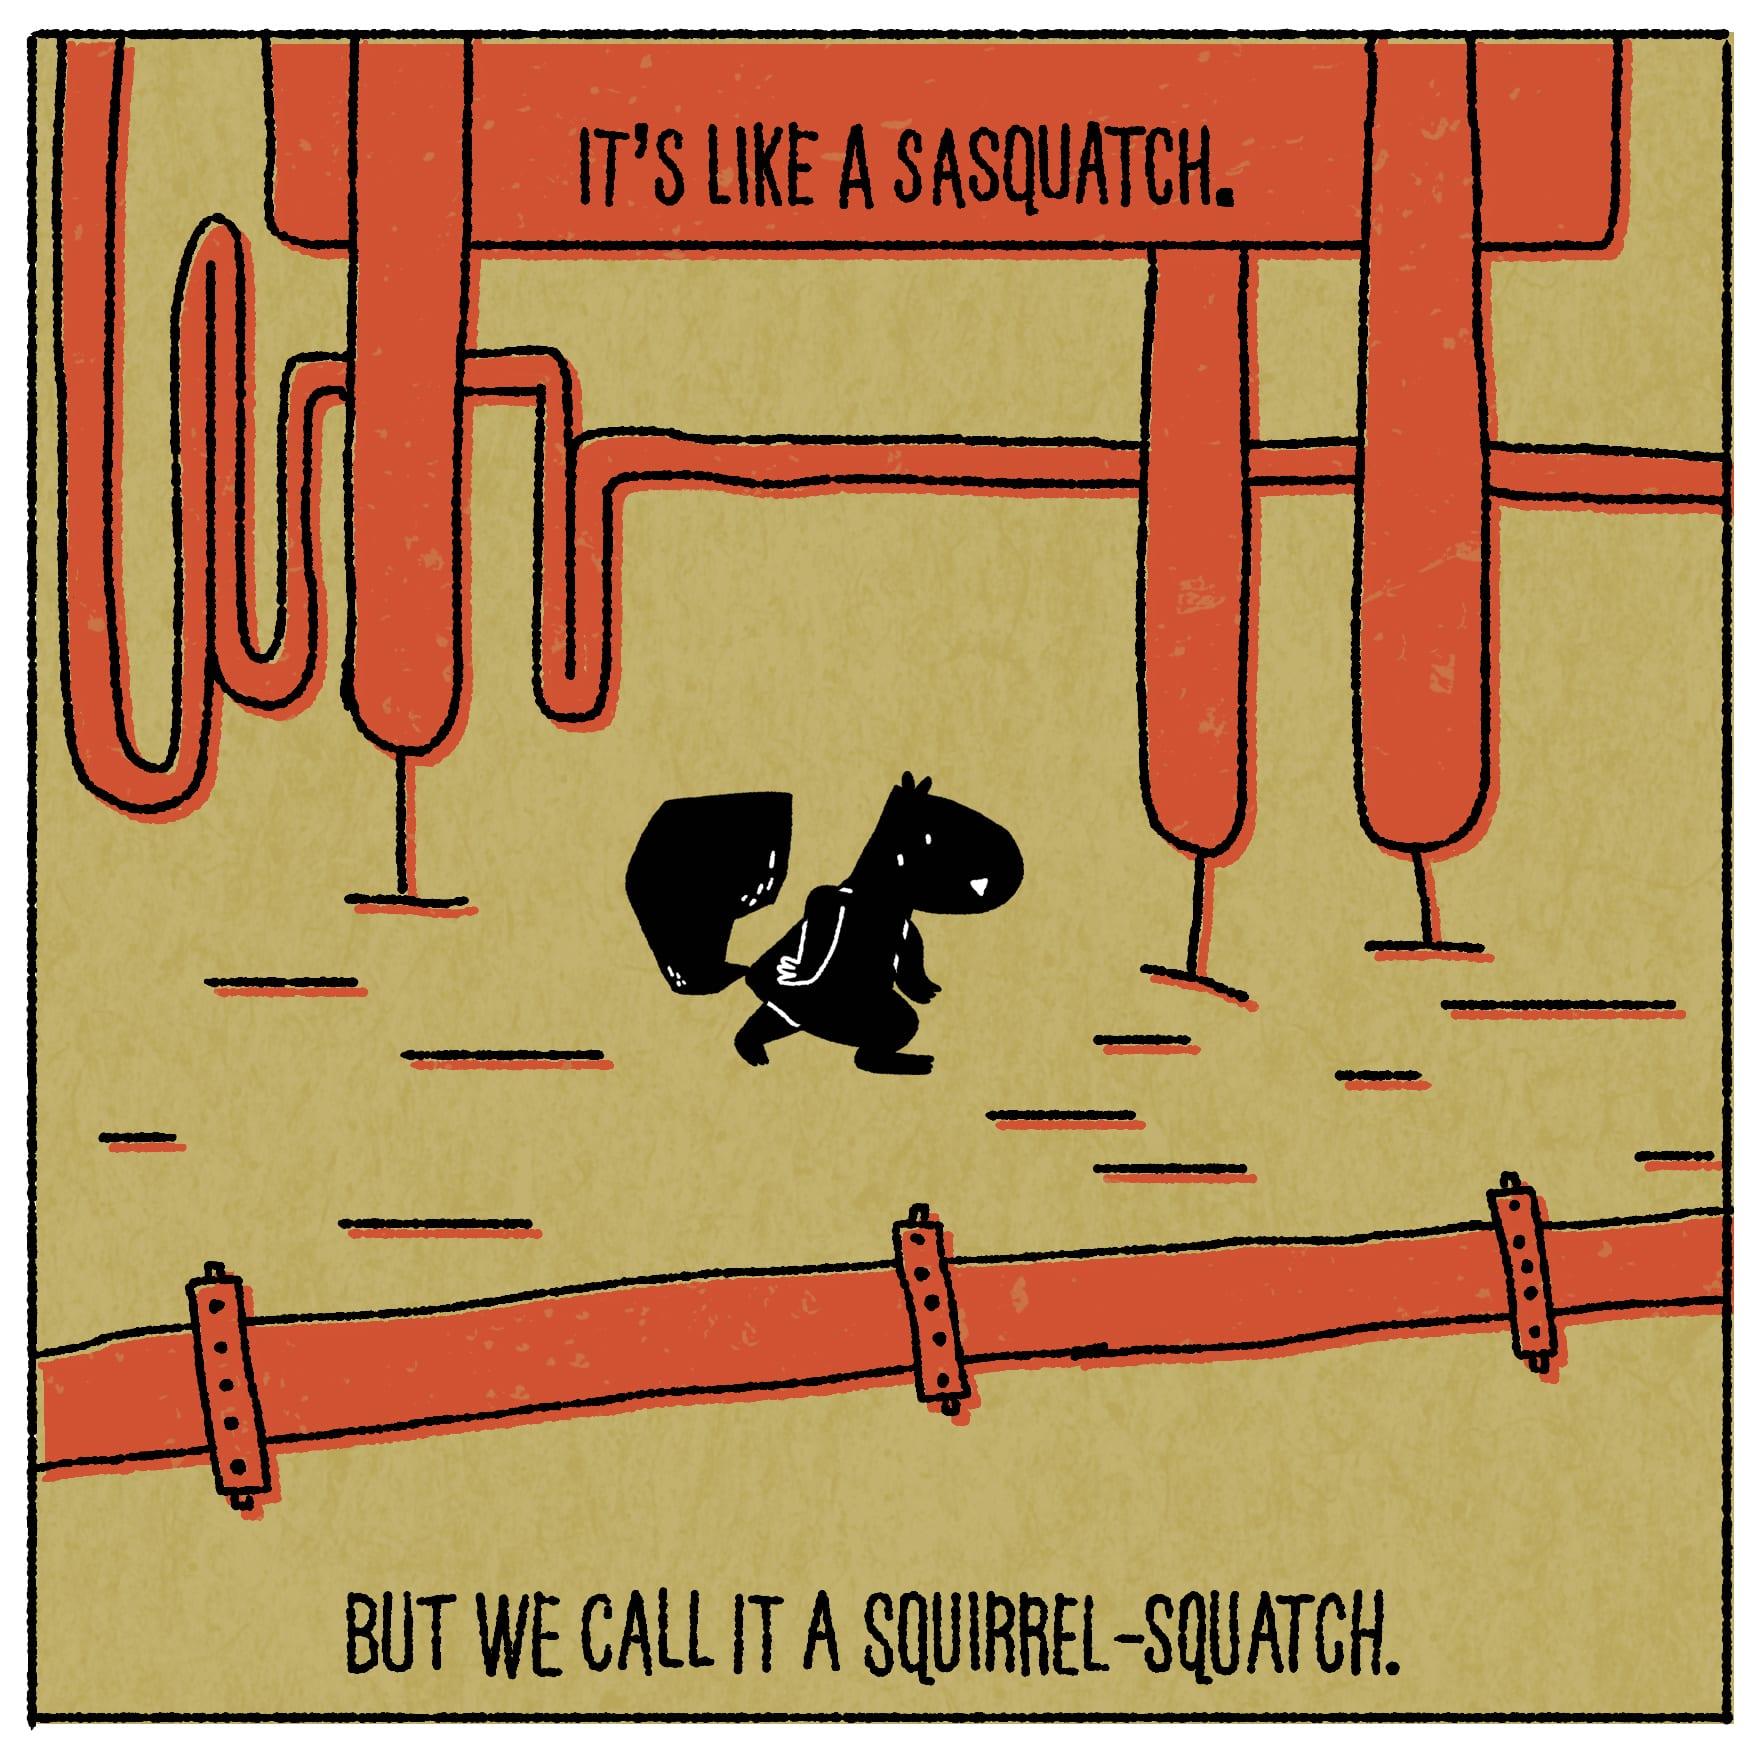 It's like a sasquatch, but we call it a squirrel-squatch.